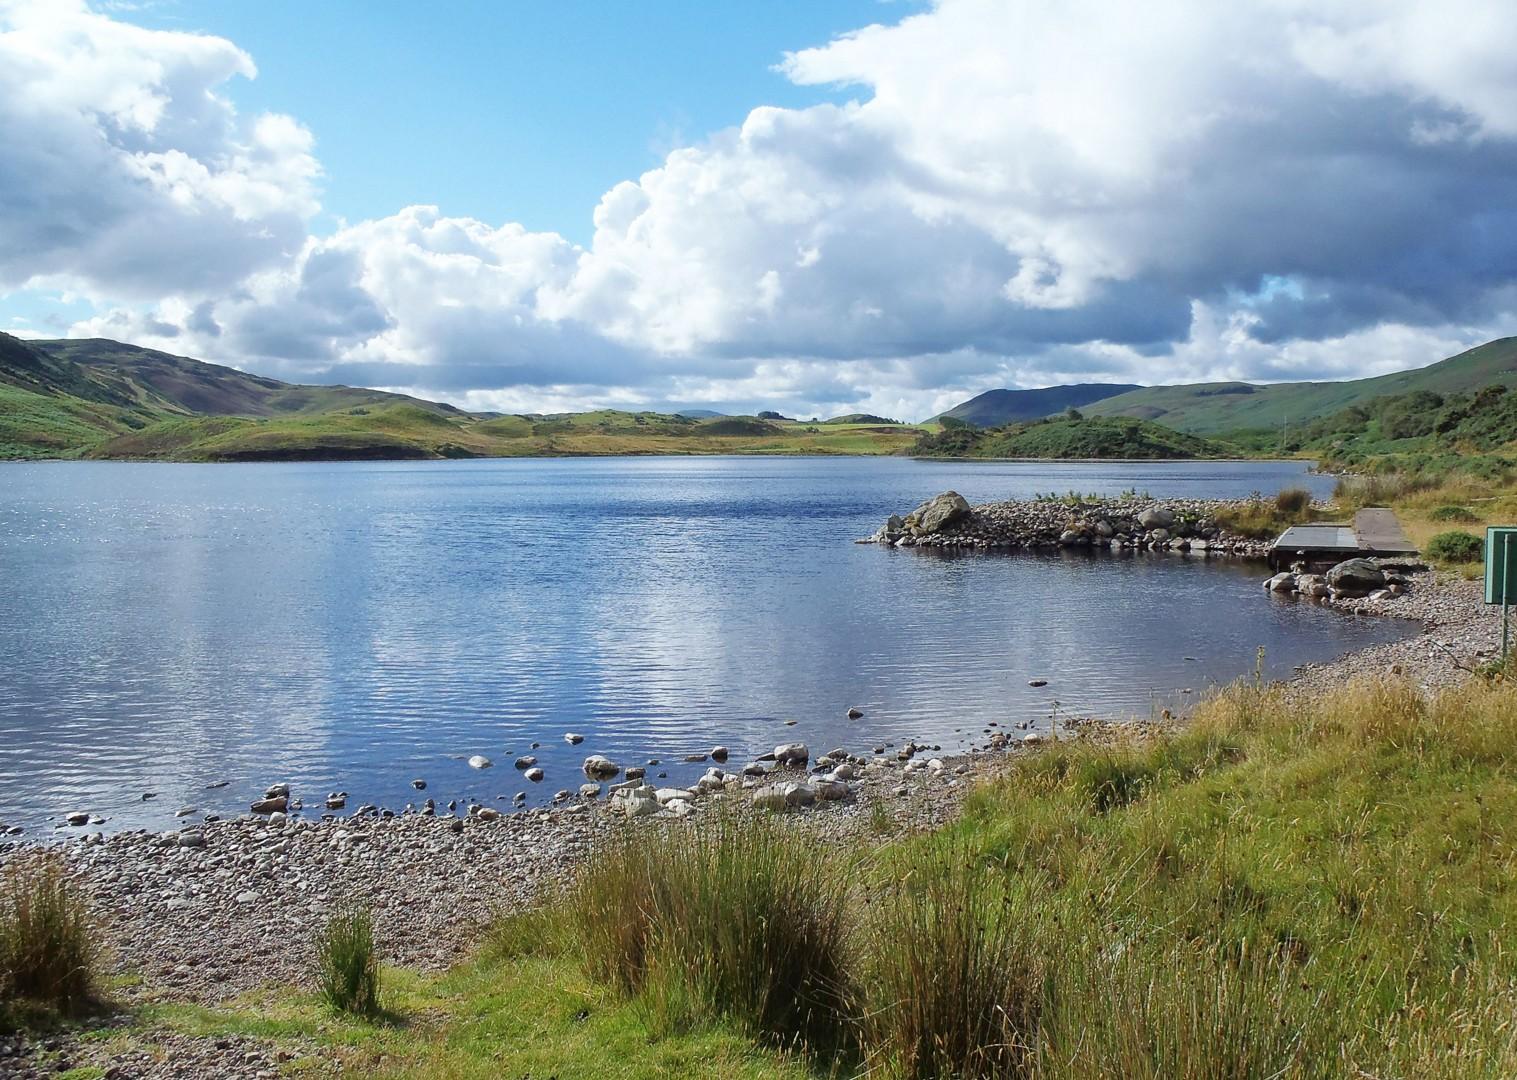 great-glen-mountain-bike-holiday-scotland.jpg - Scotland - Celtic Crossing - Guided Mountain Bike Holiday - Mountain Biking